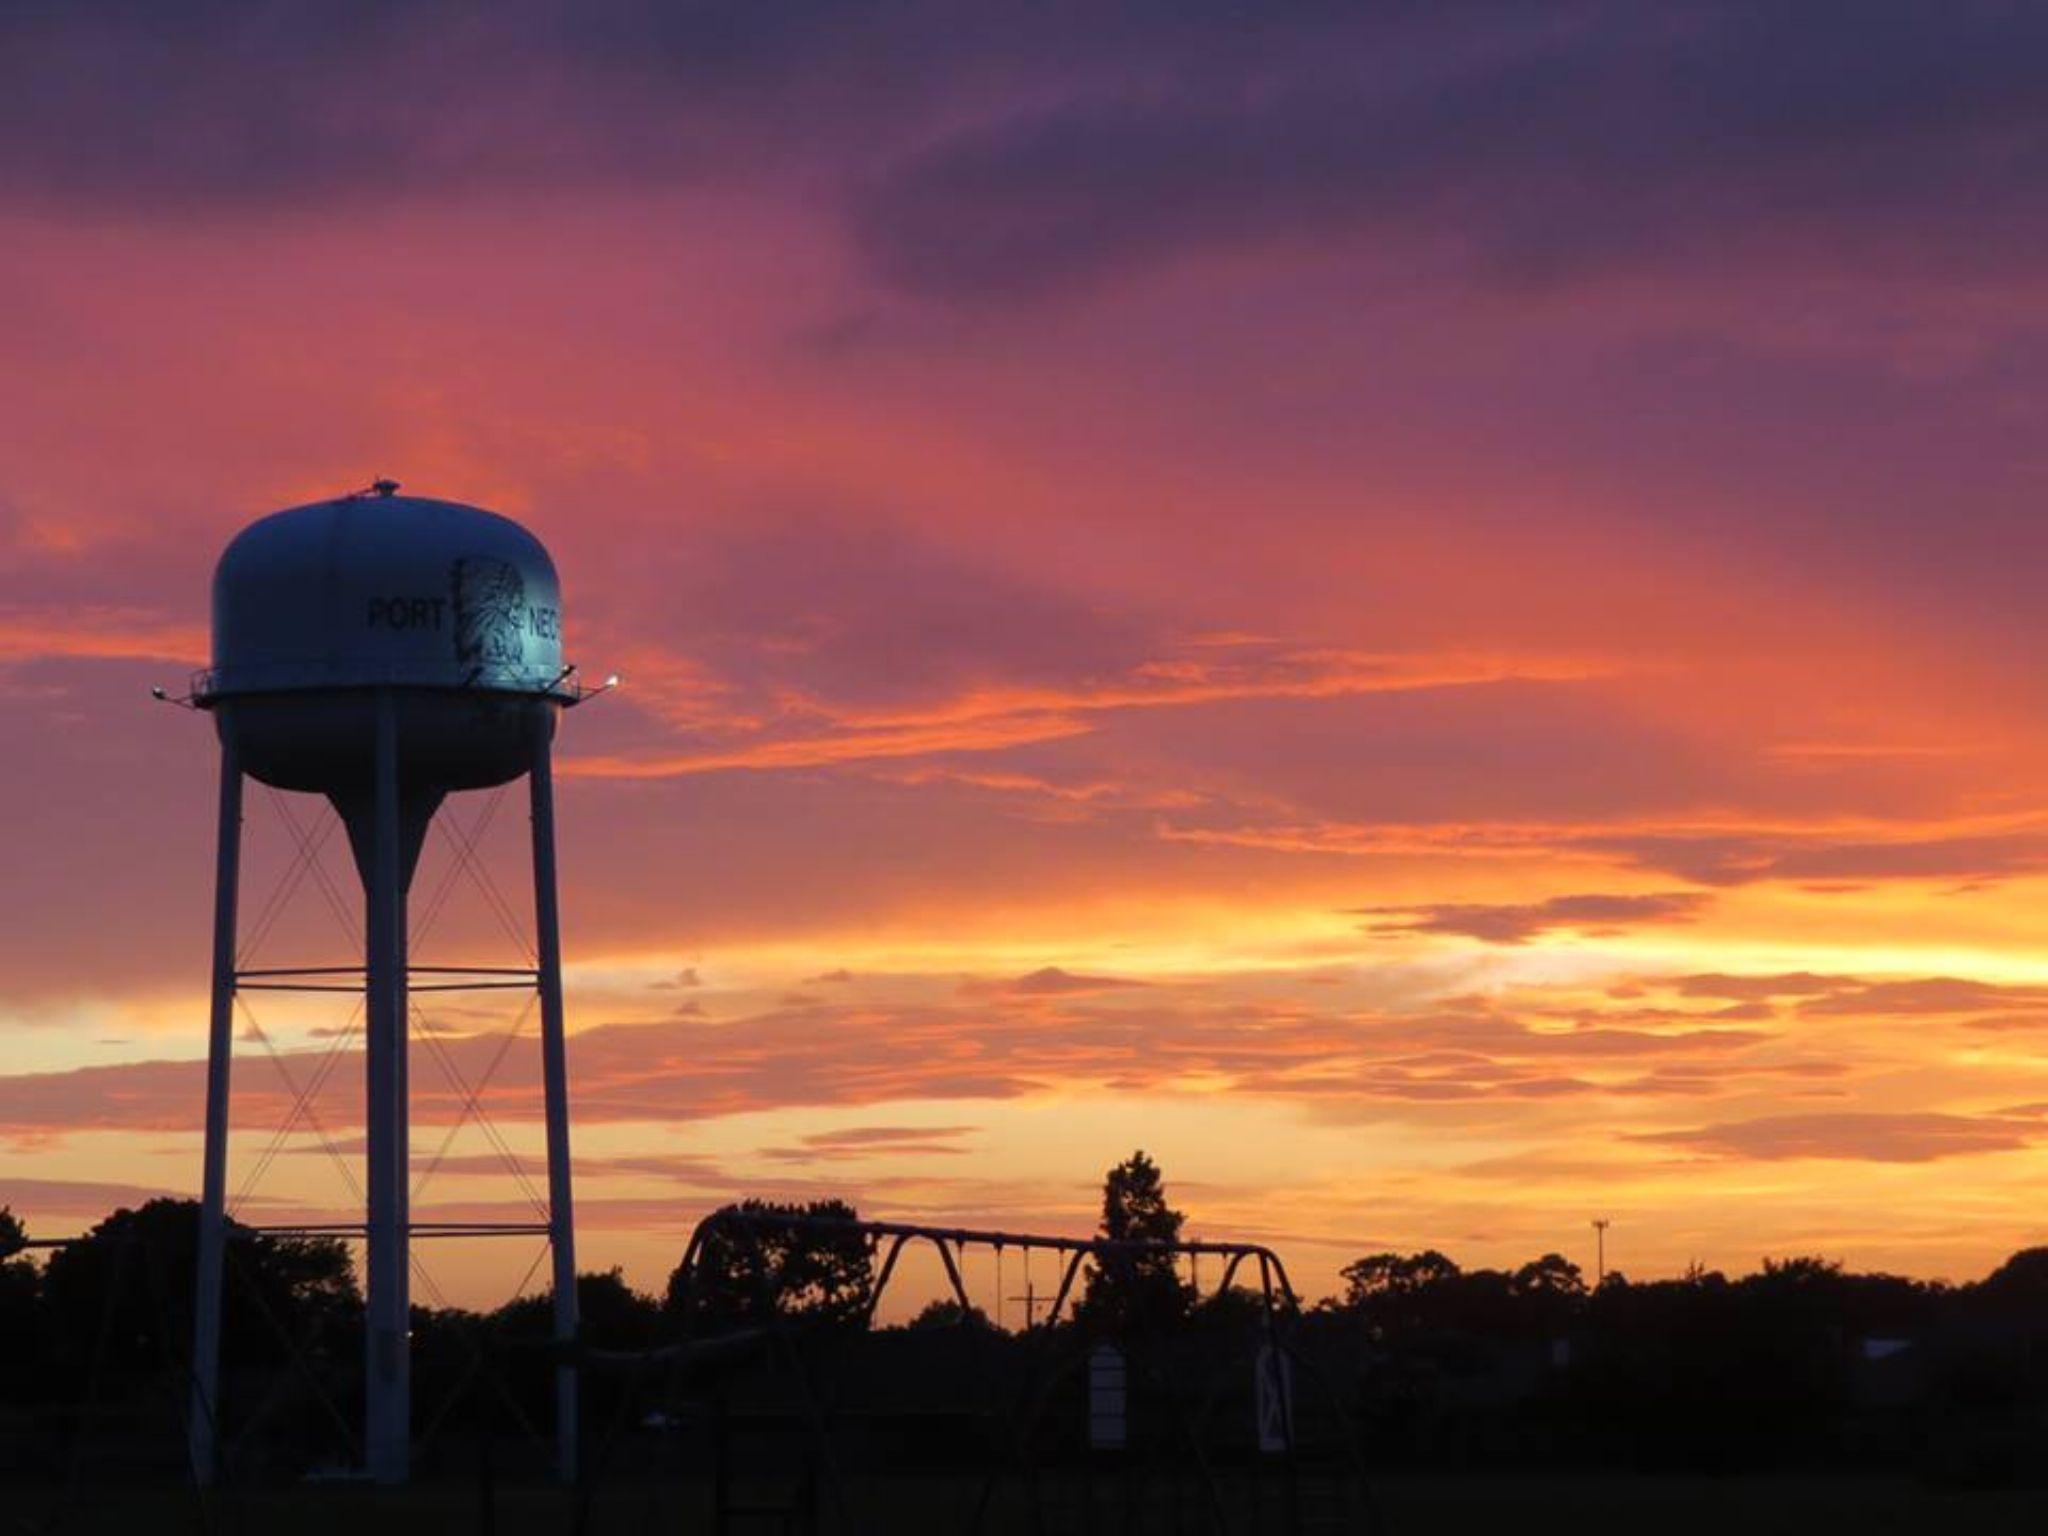 sunset by jerrym